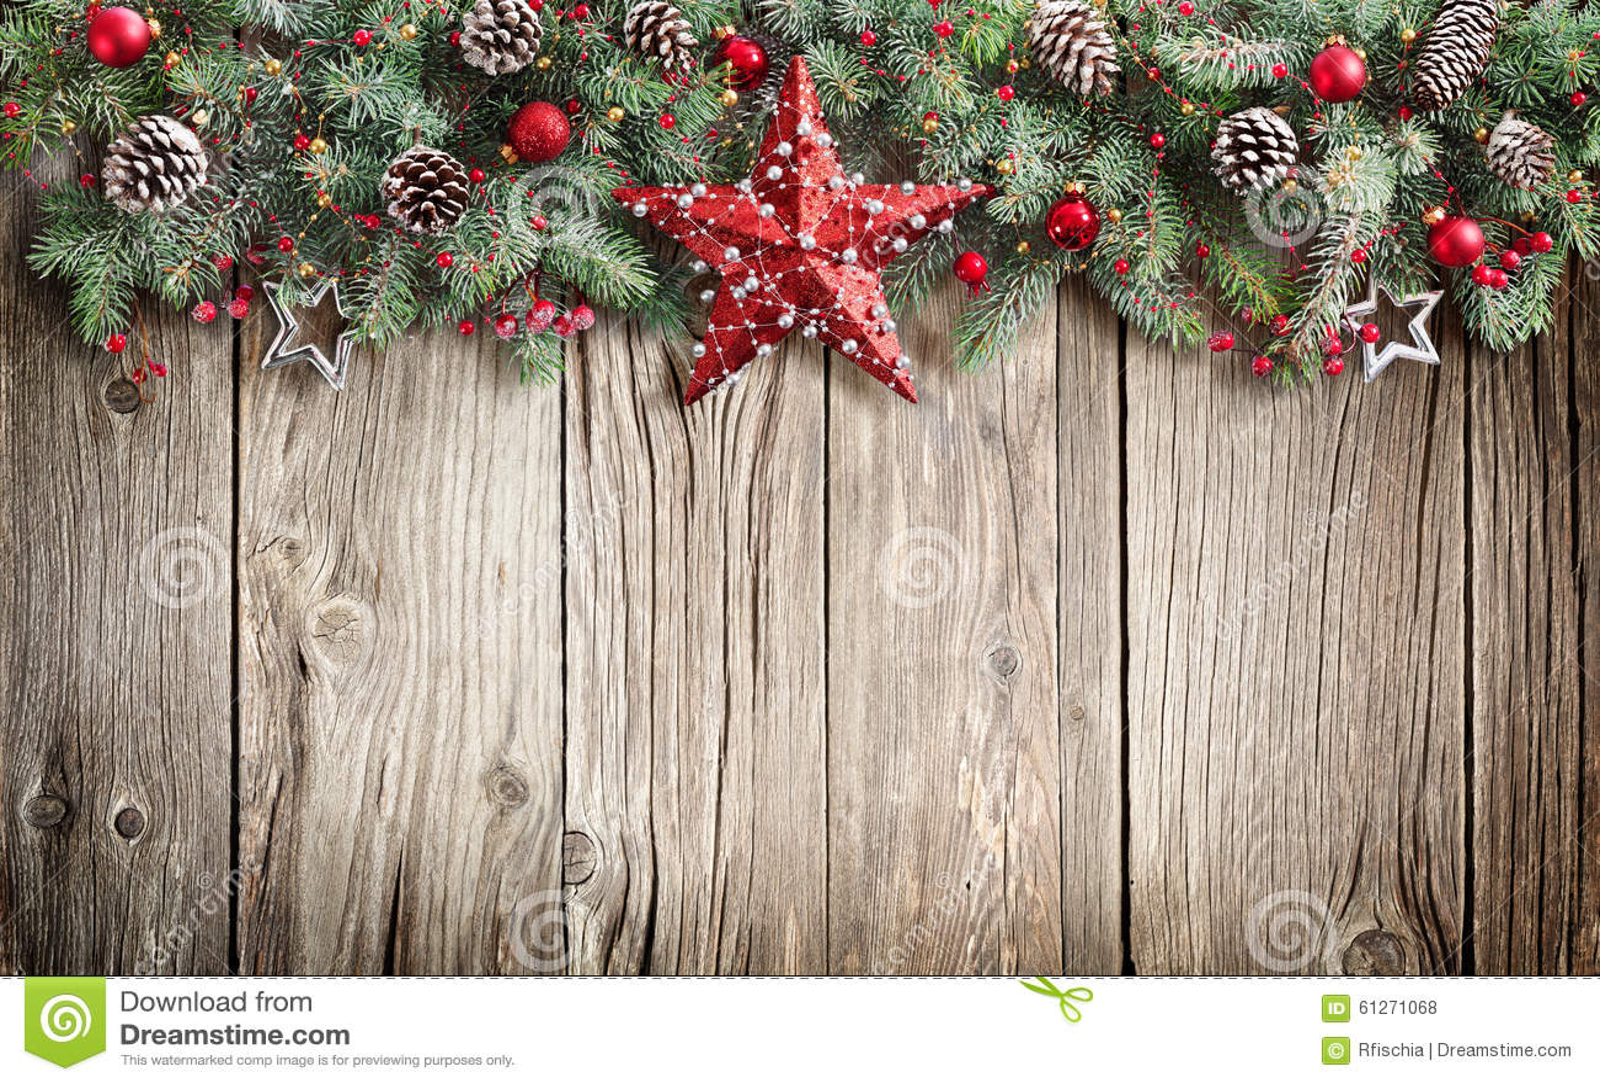 Christmas fir tree decorated on wooden stock photo image - Sapin de noel deja decore ...